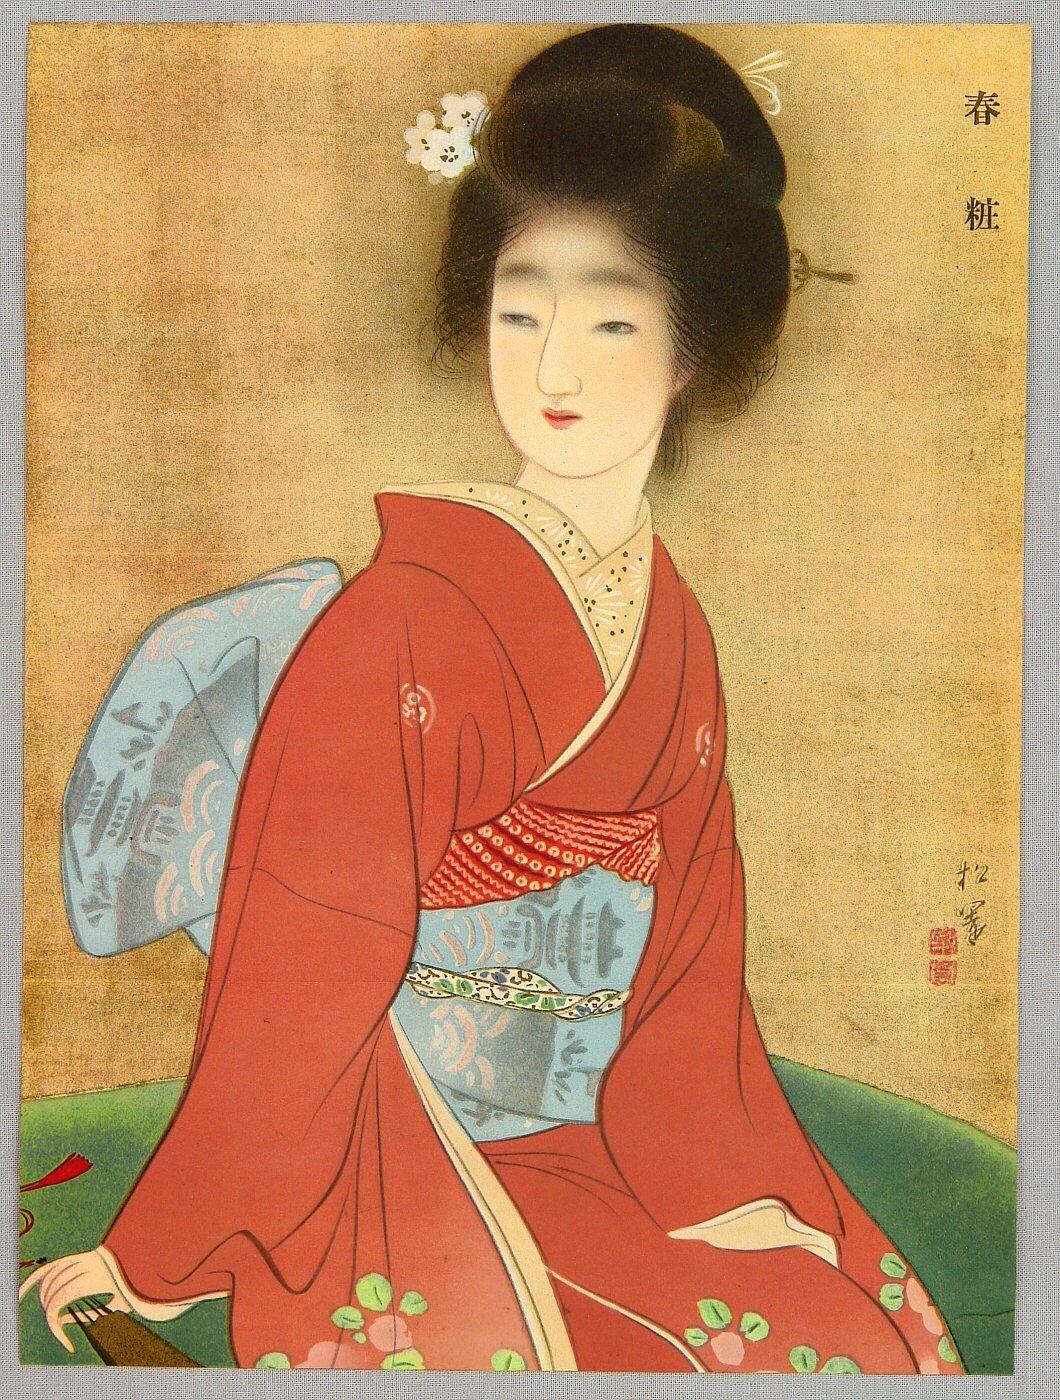 Uemura Shoen, Beauty in Spring, kuchie, lithograph